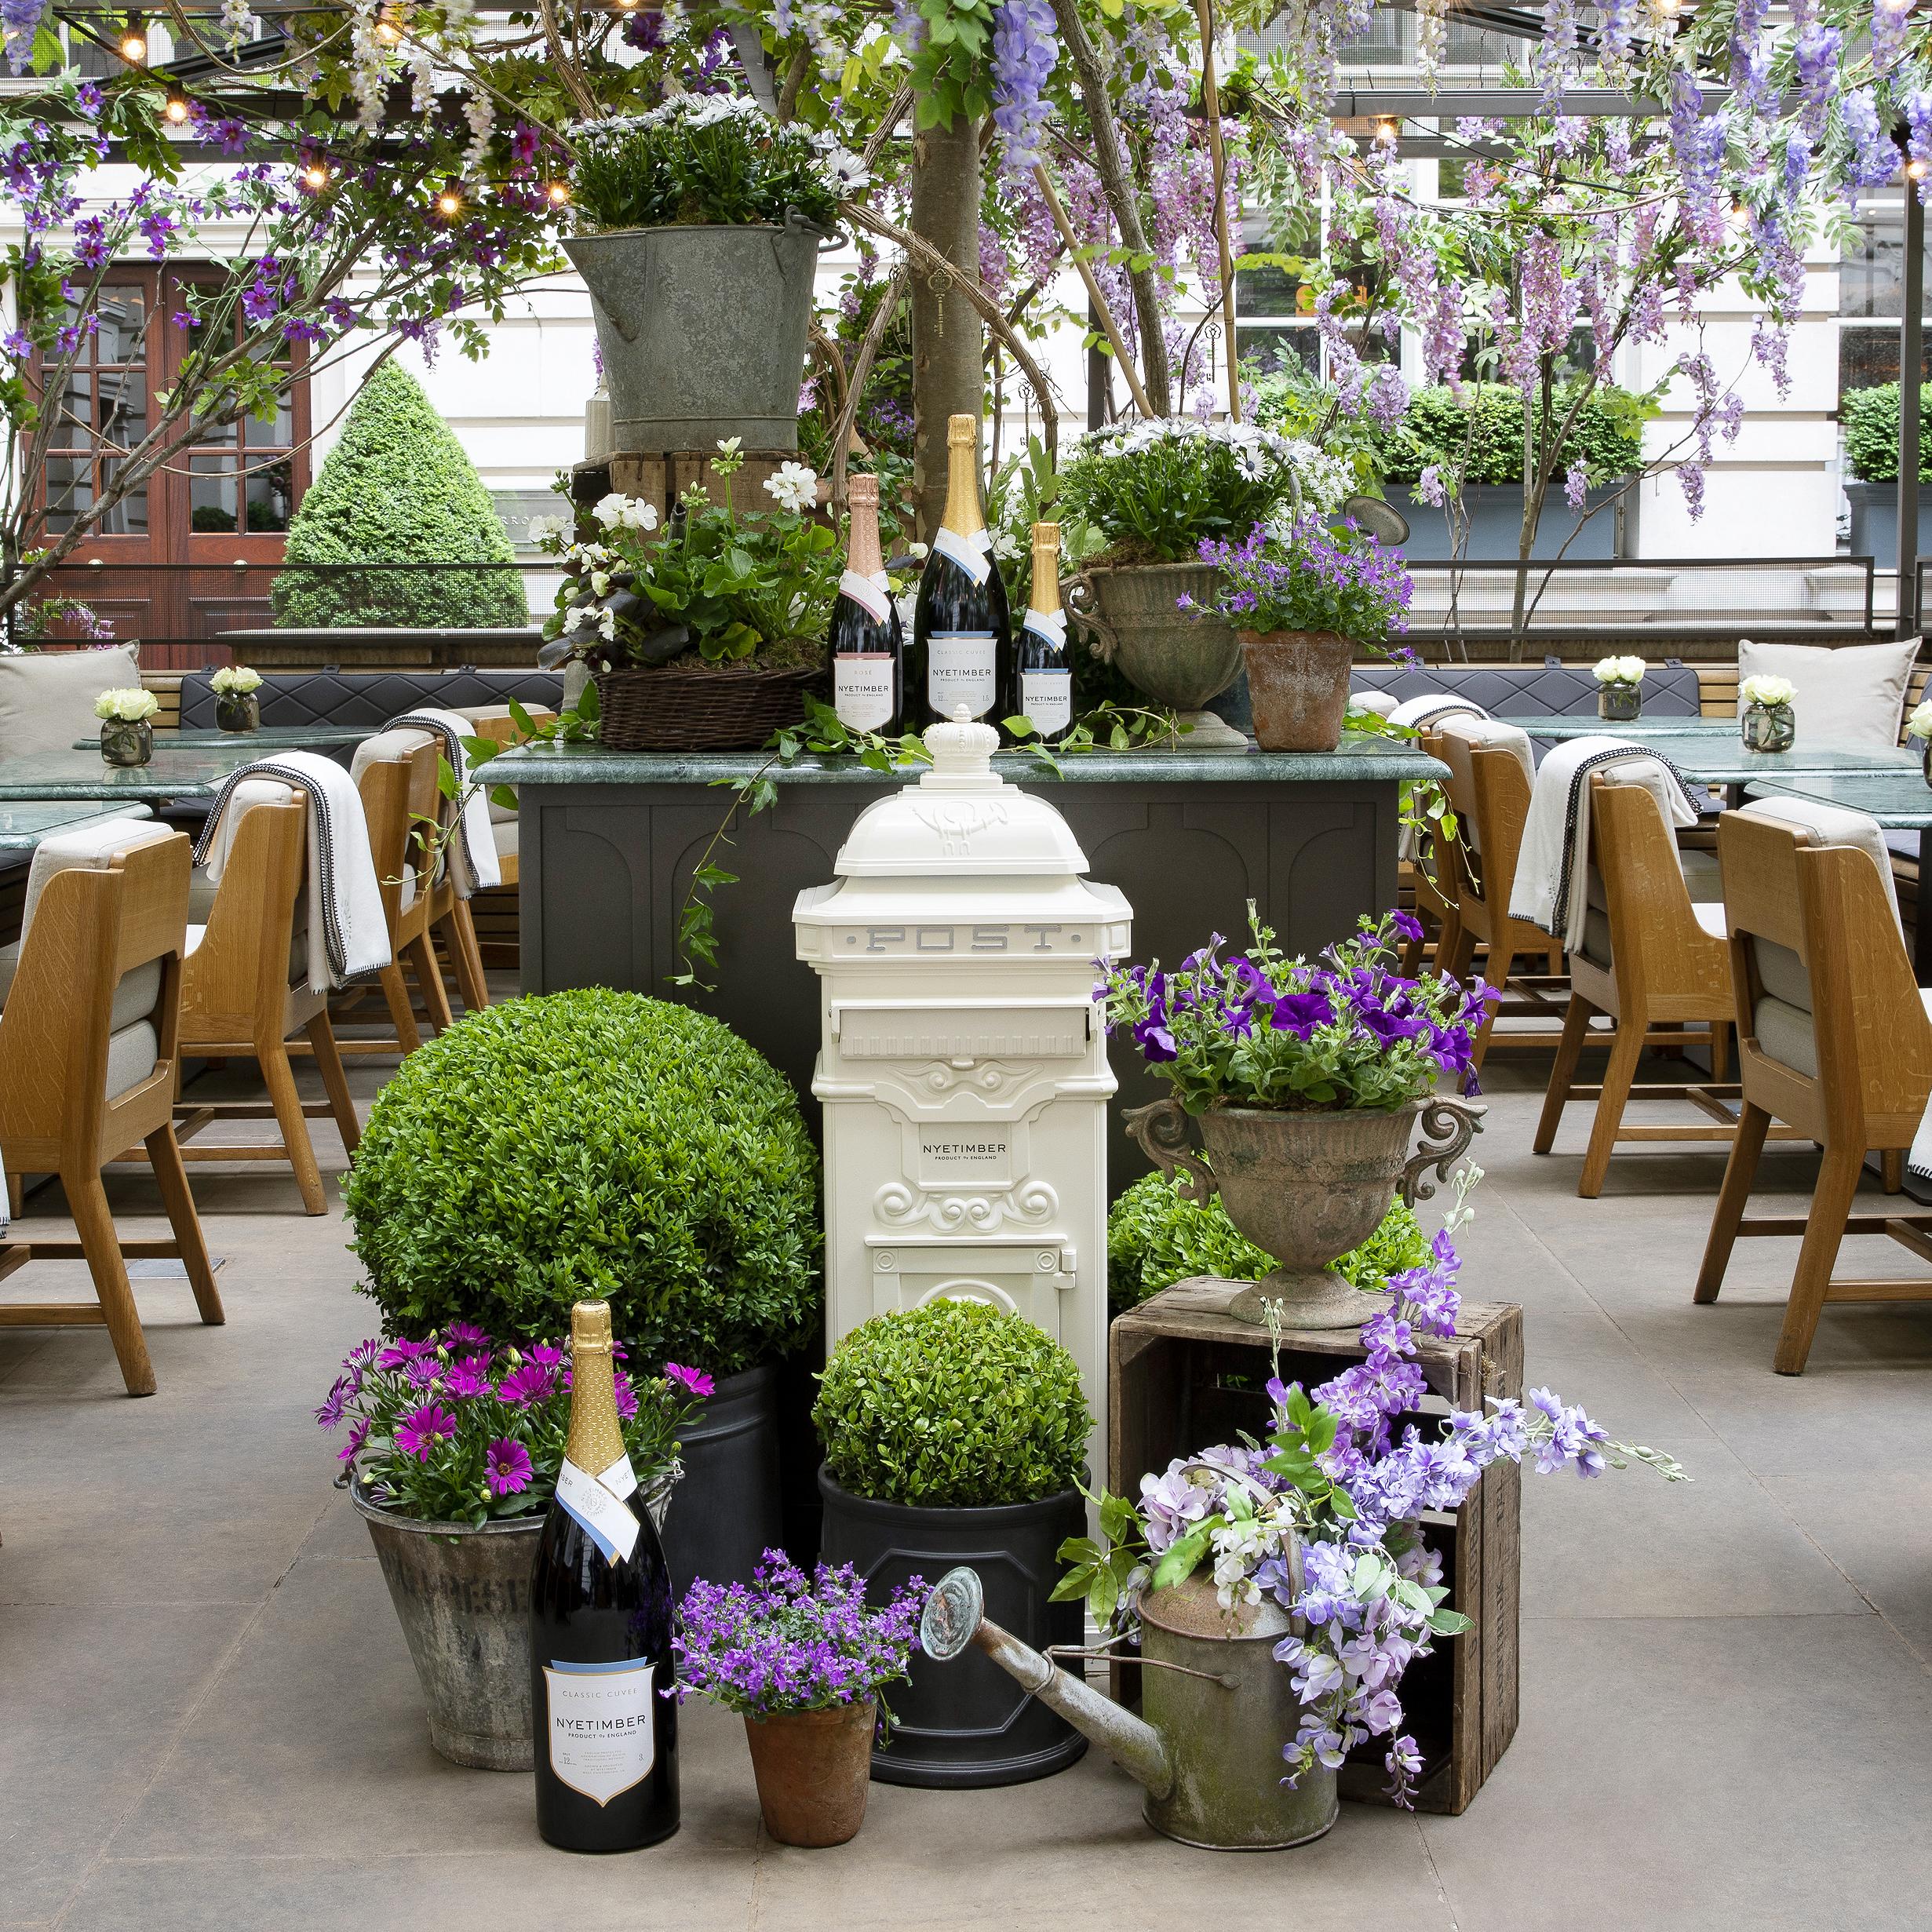 Holborn Dining Room_The Nyetimber Secret Garden_Central Piece_©John Carey.jpg